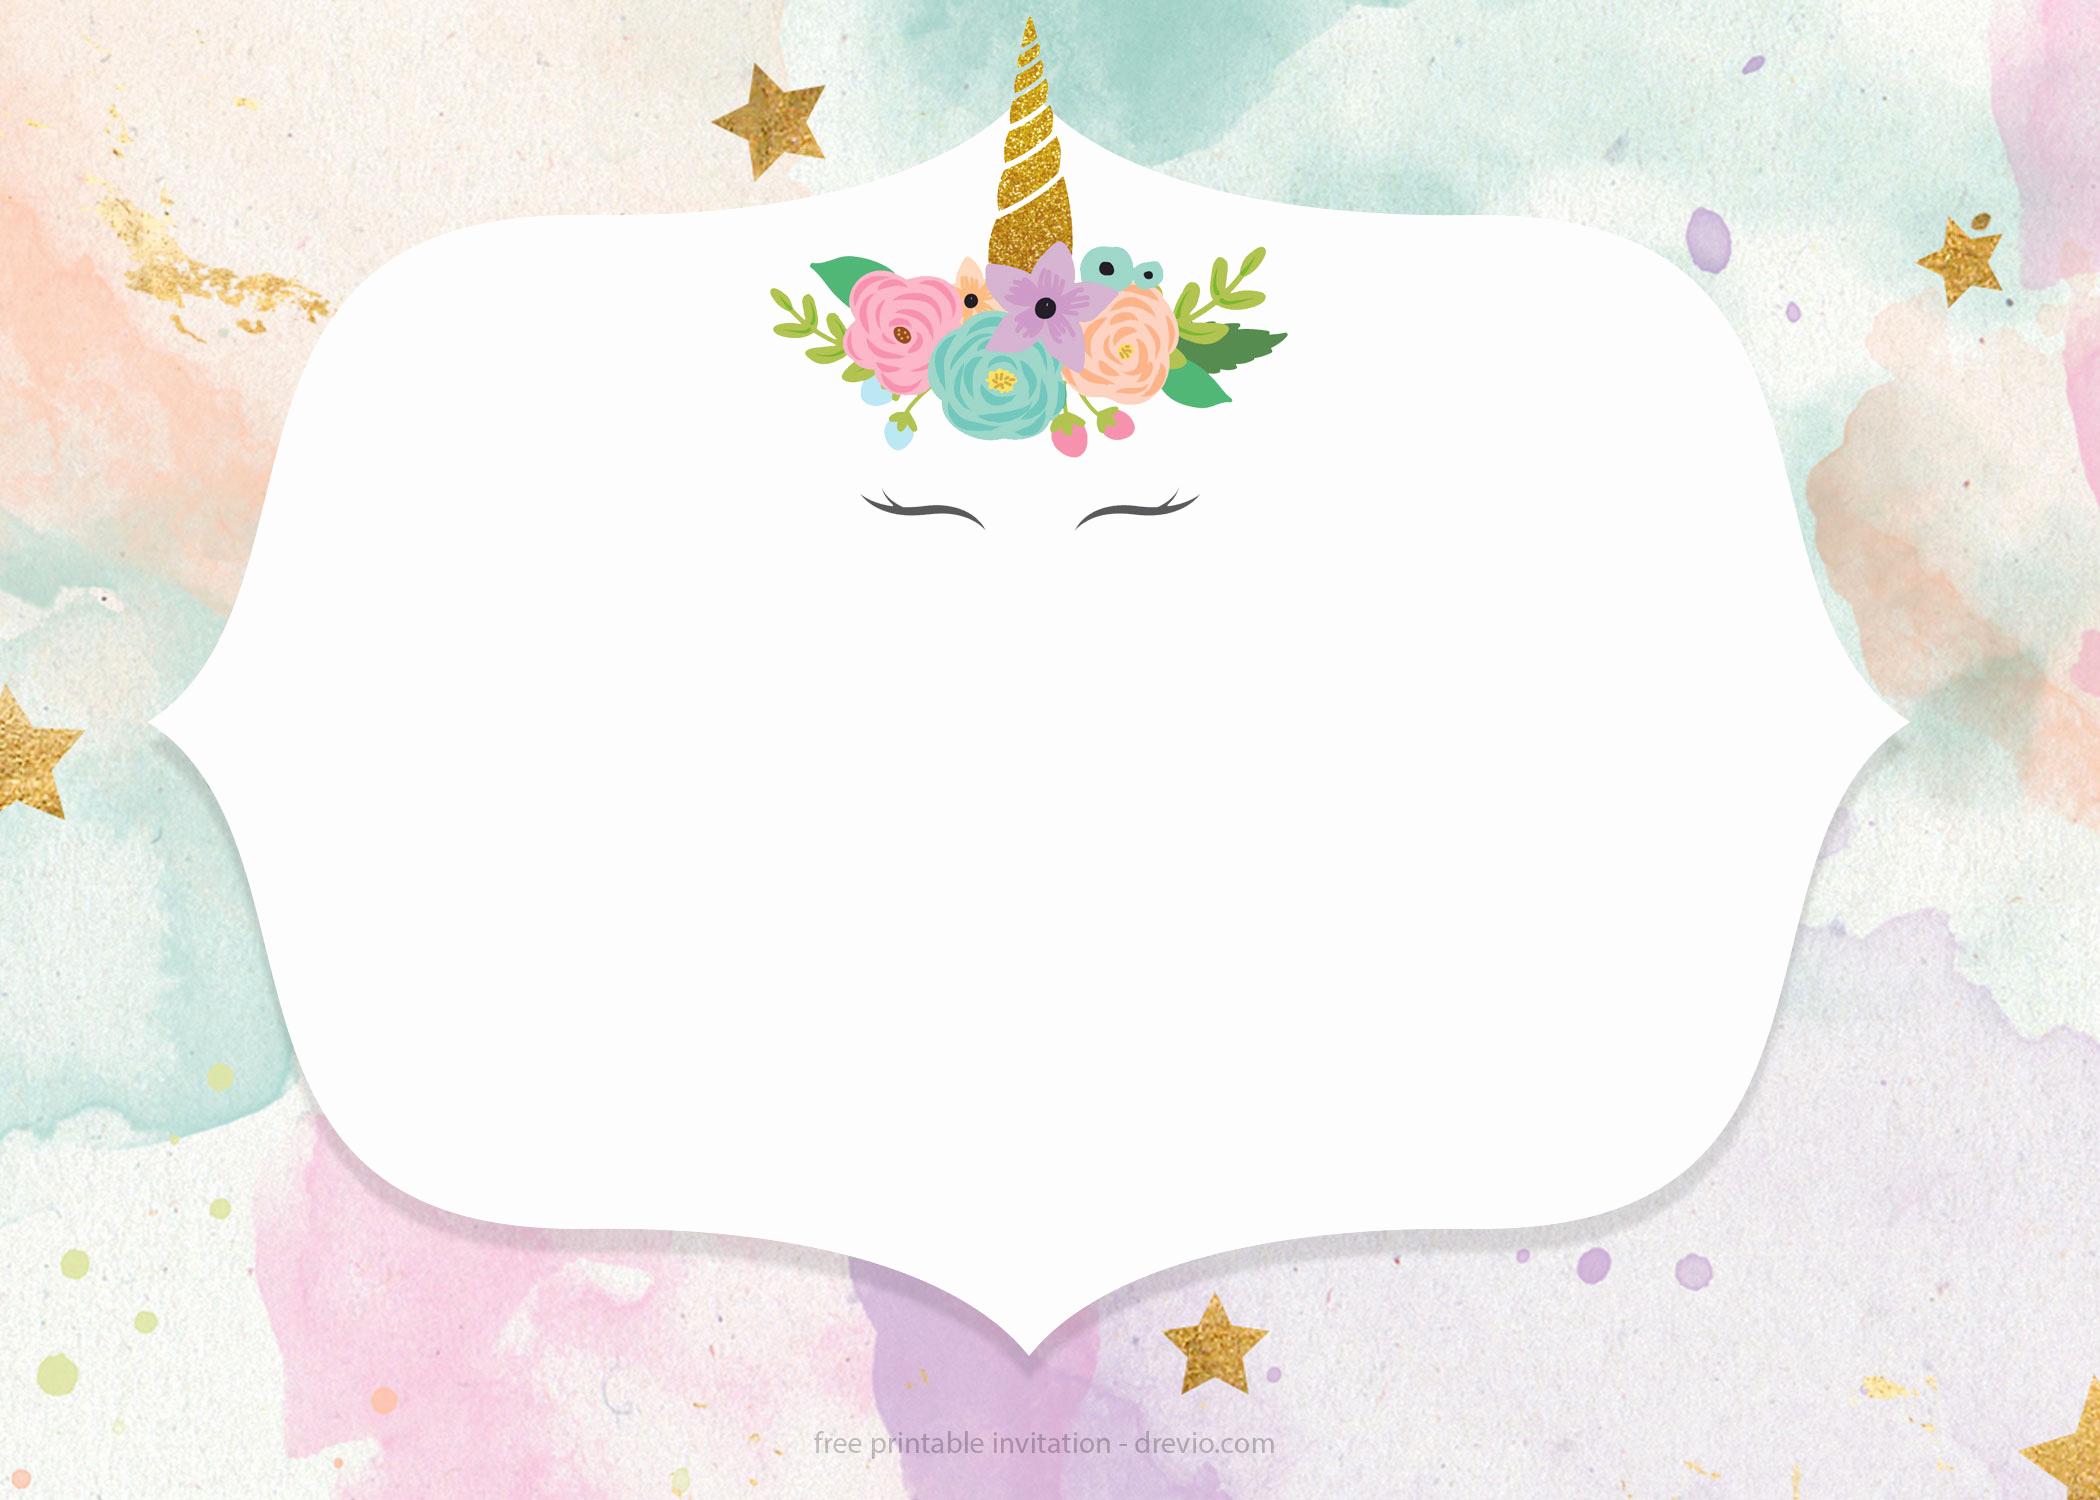 Unicorn Invitation Template Free Beautiful Free Printable Golden Unicorn Birthday Invitation Template